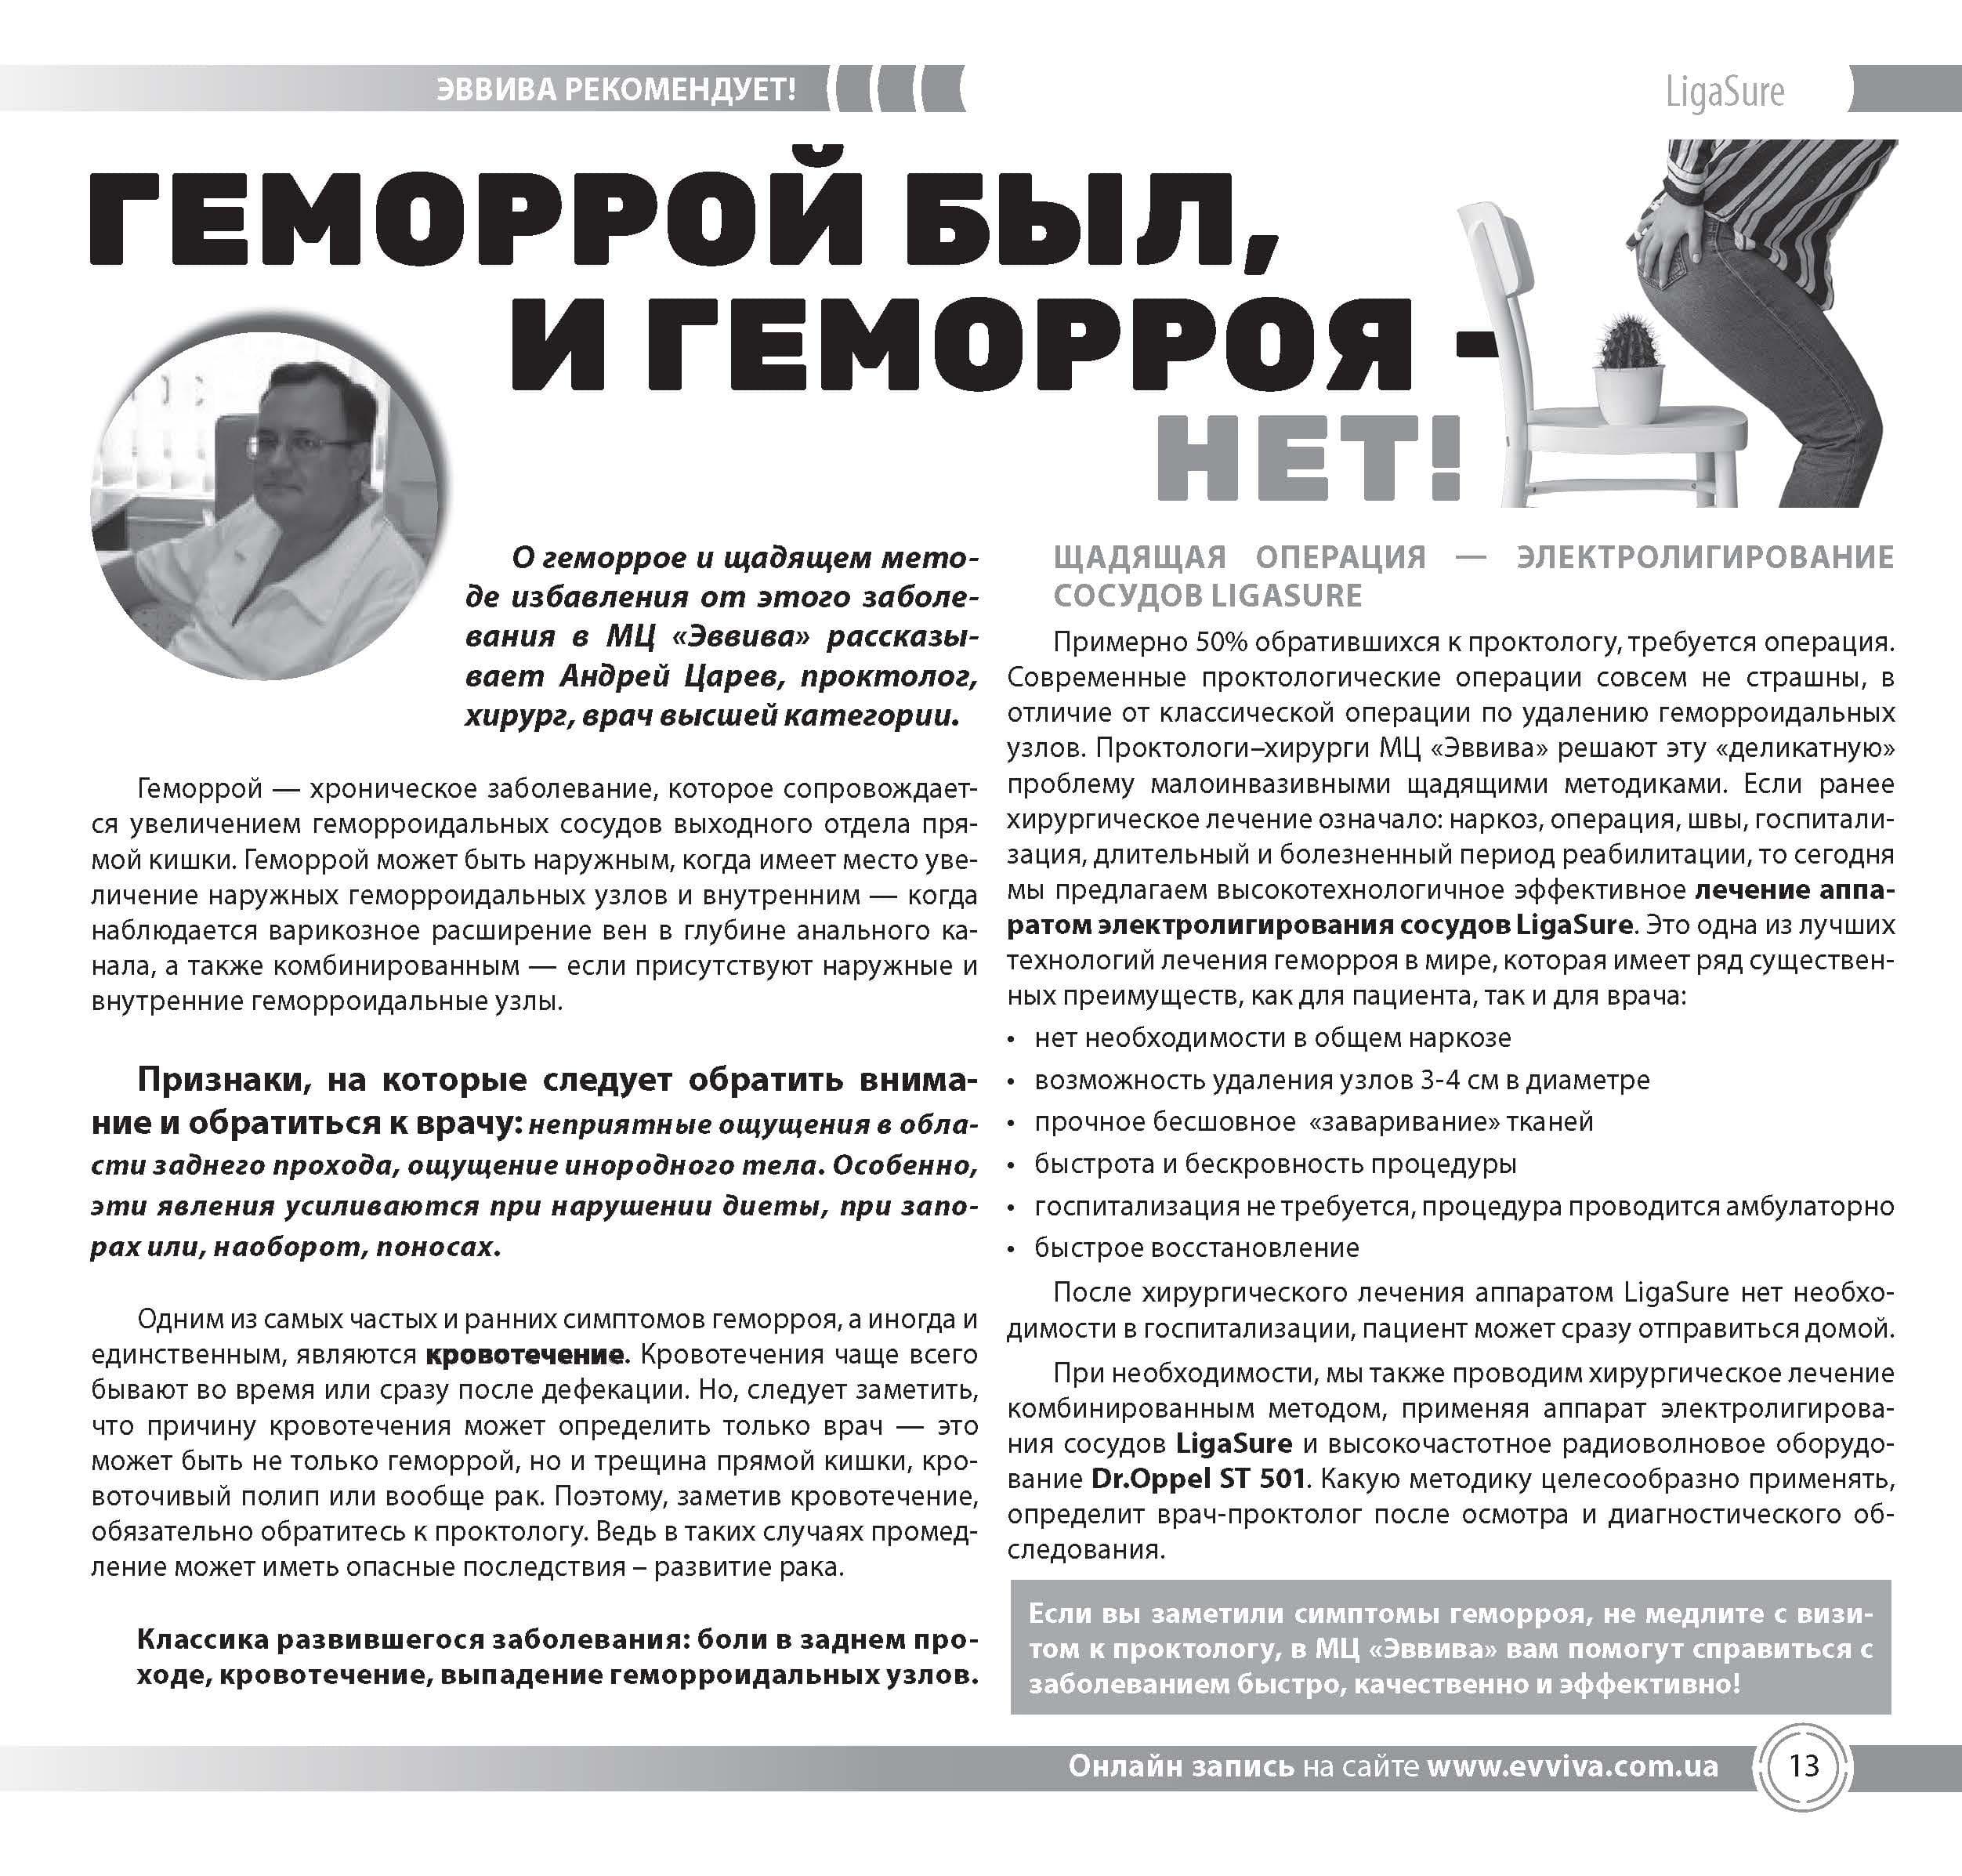 evviva-zhurnal-119-page13